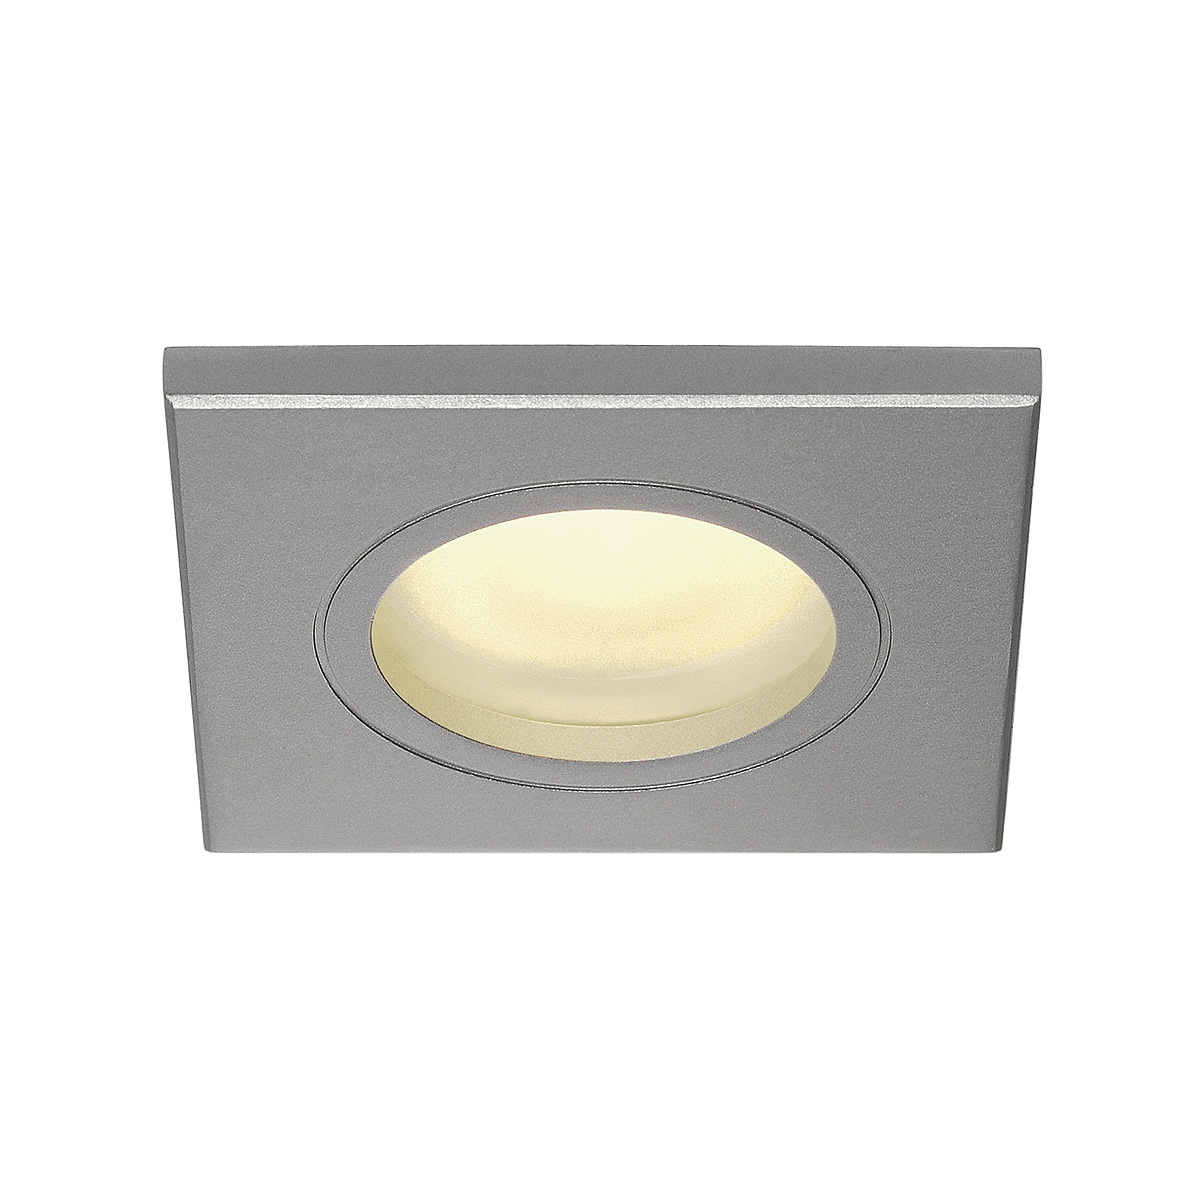 "Led Lampe F?r Dusche : LED ""Dusche-Q"" silber"